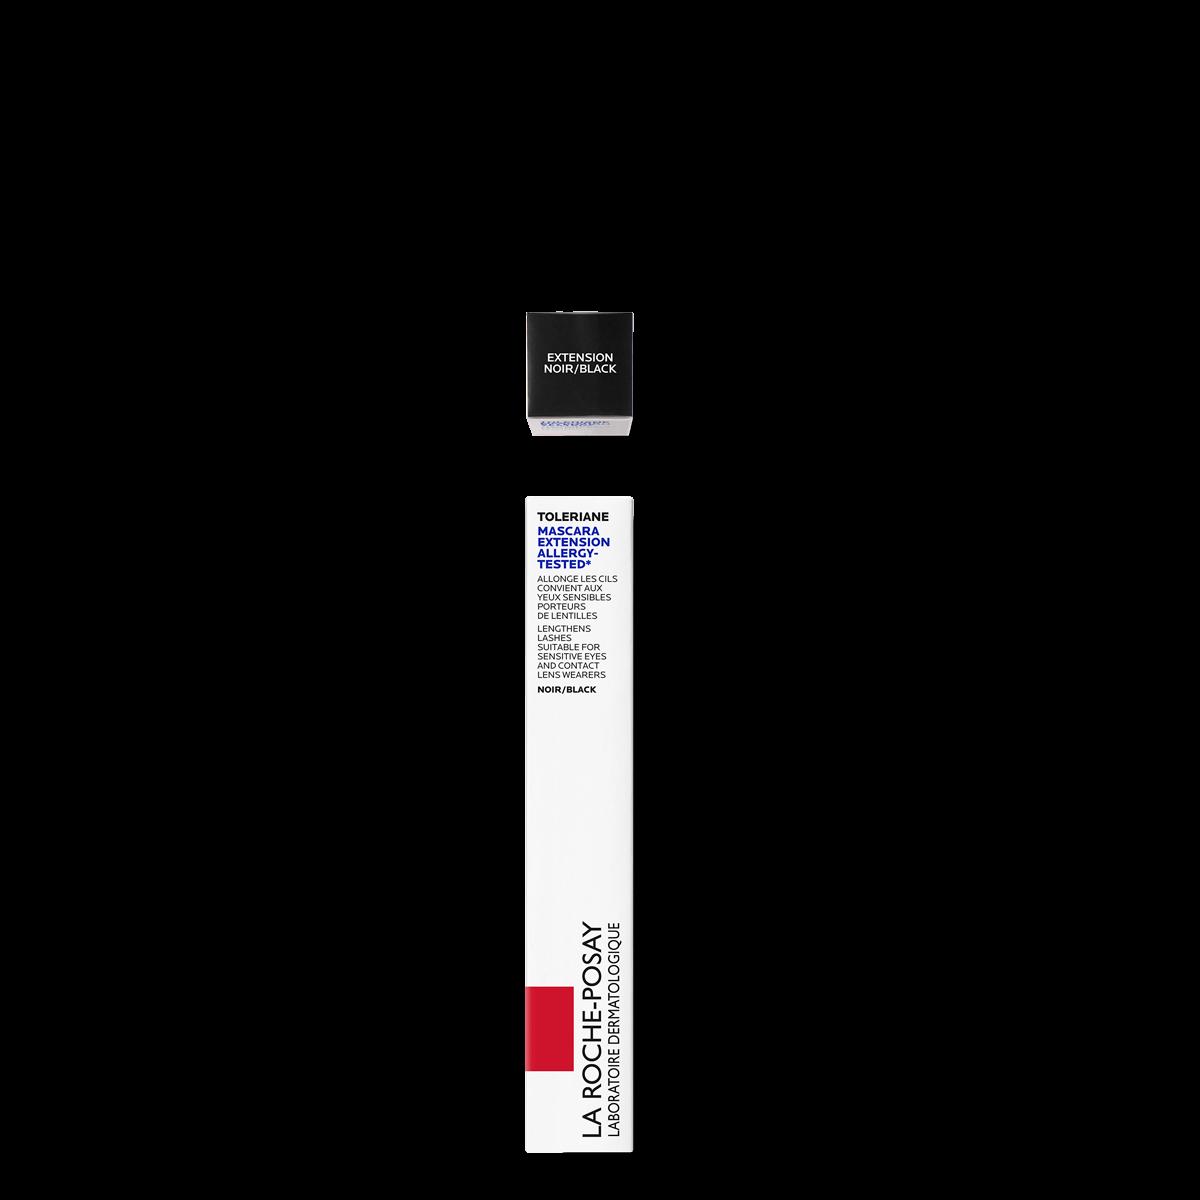 La Roche Posay Sensitive Toleriane Make up EXTENSION MASCARA Black 333